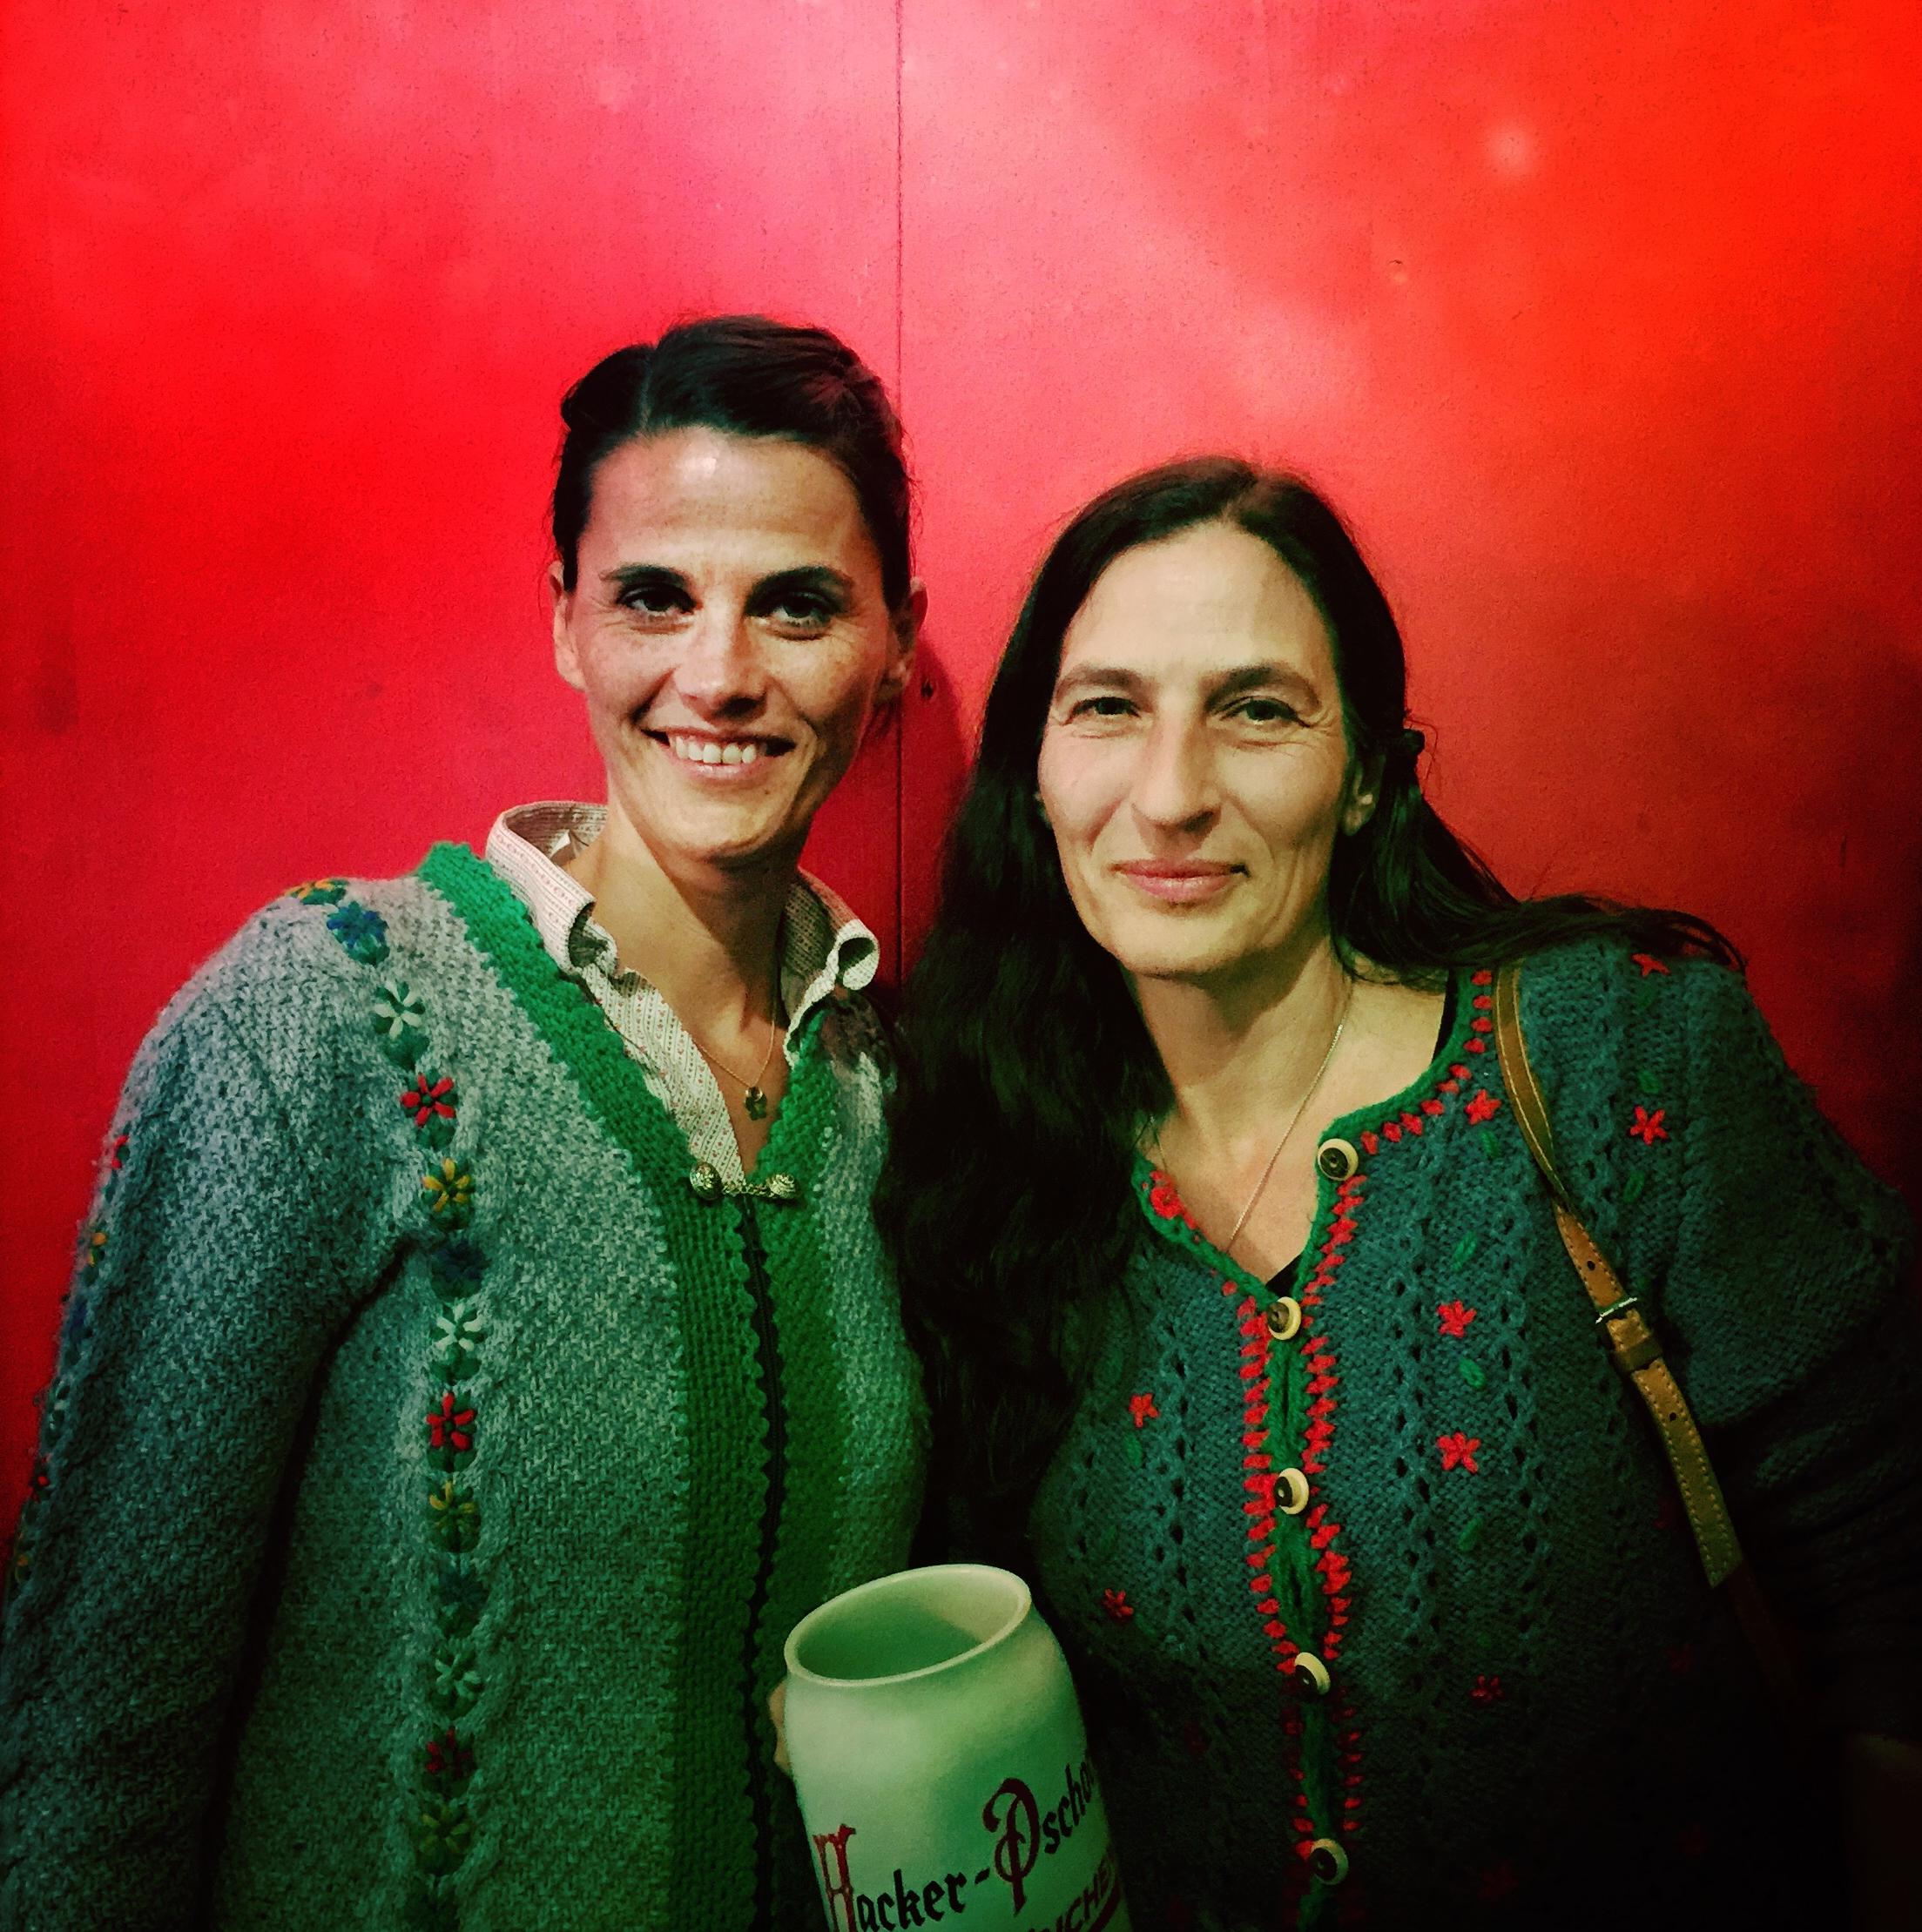 Karin Stüwe & Renate Heilmeier